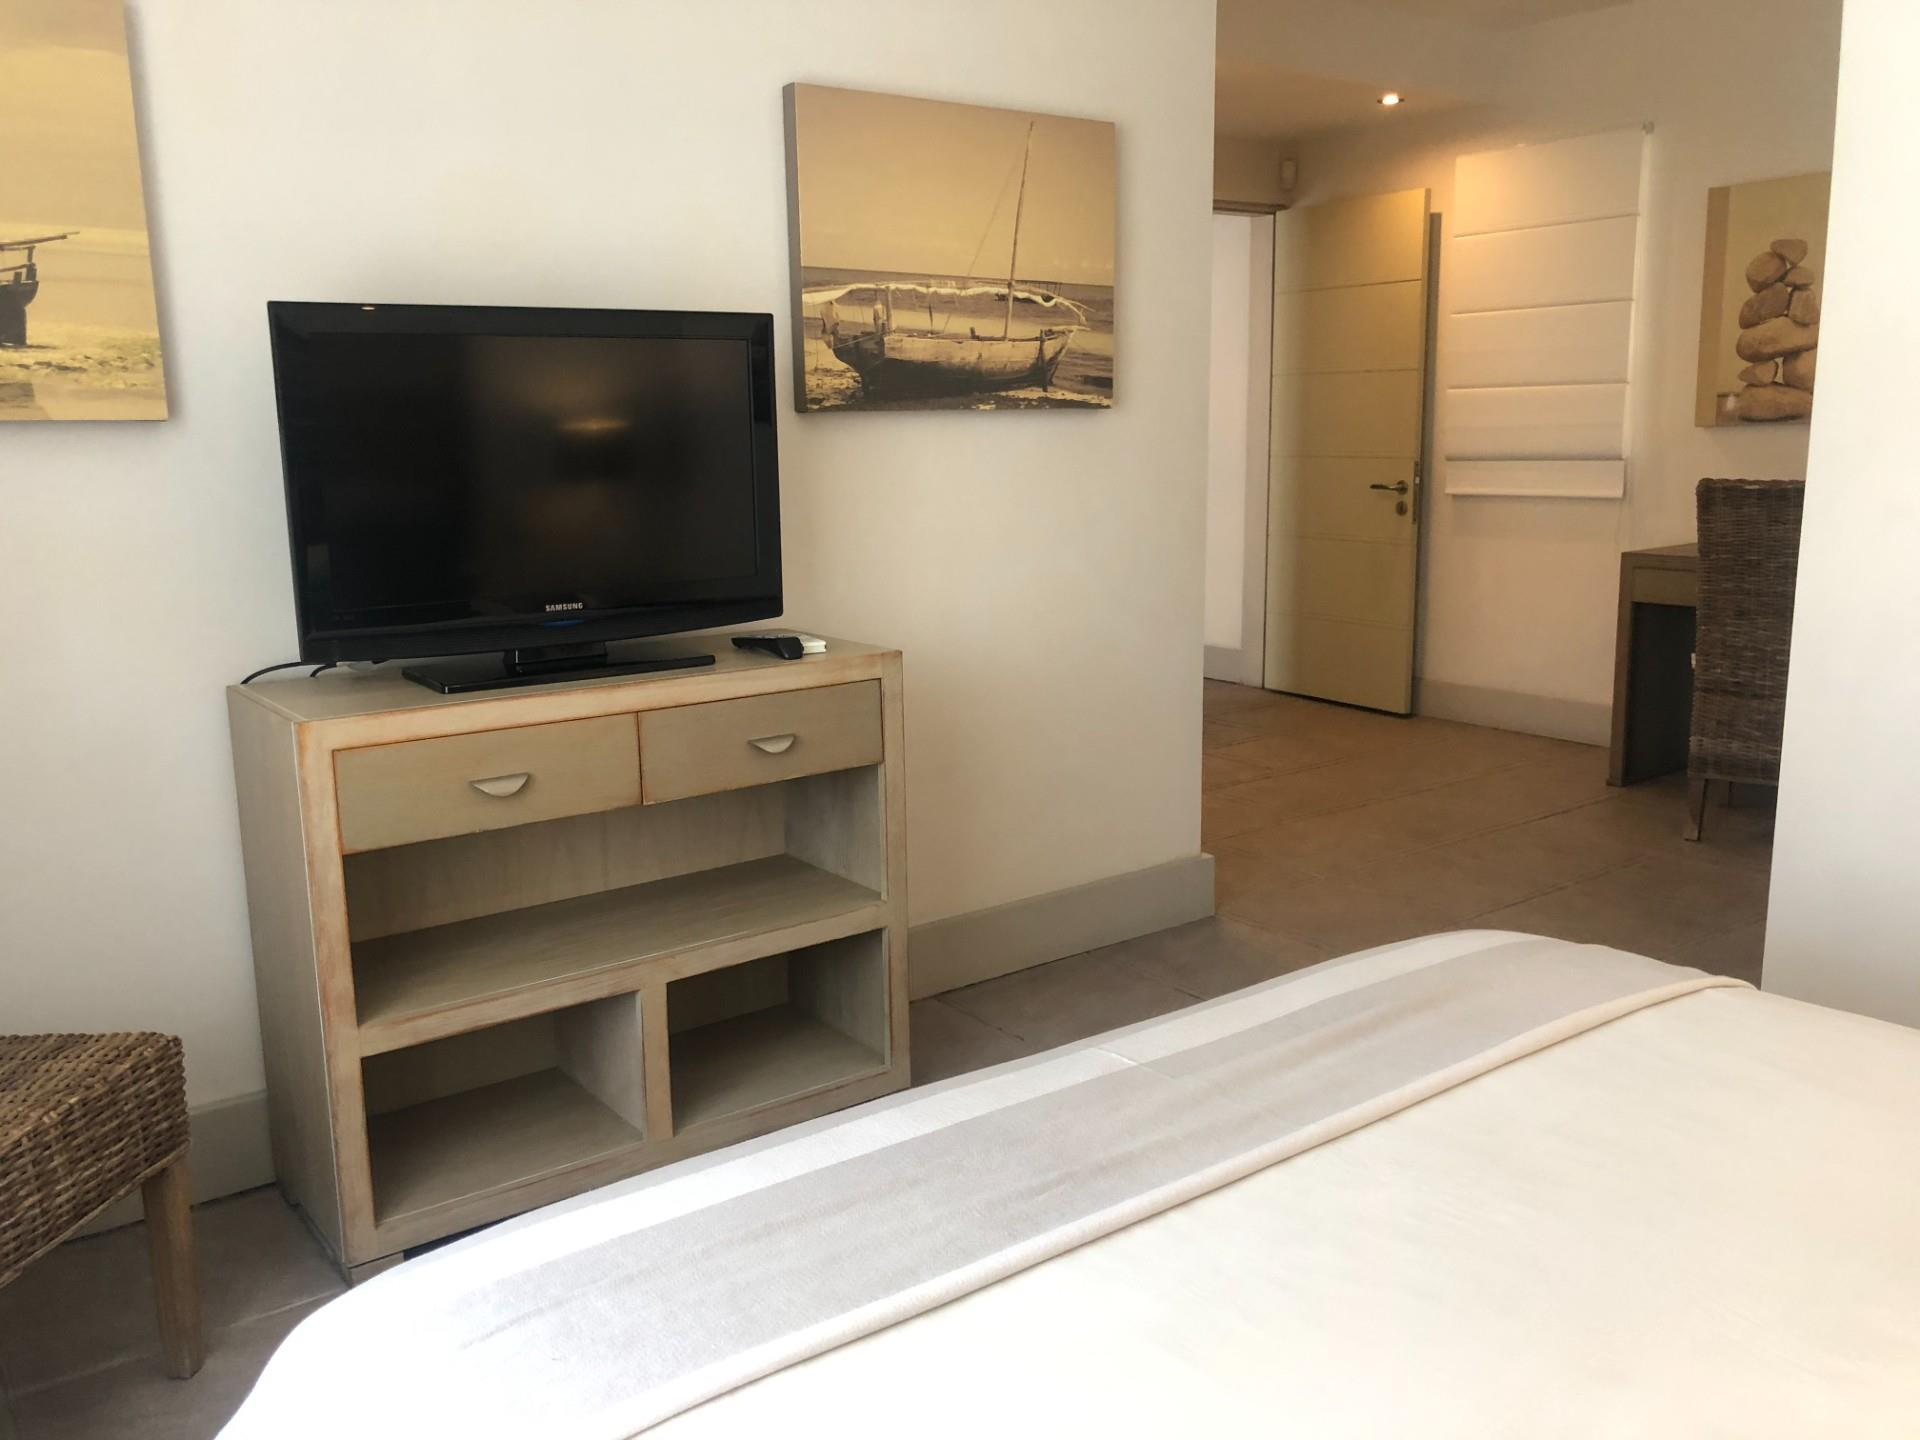 3 Bedroom Apartment / Flat For Sale in Cap Malheureux